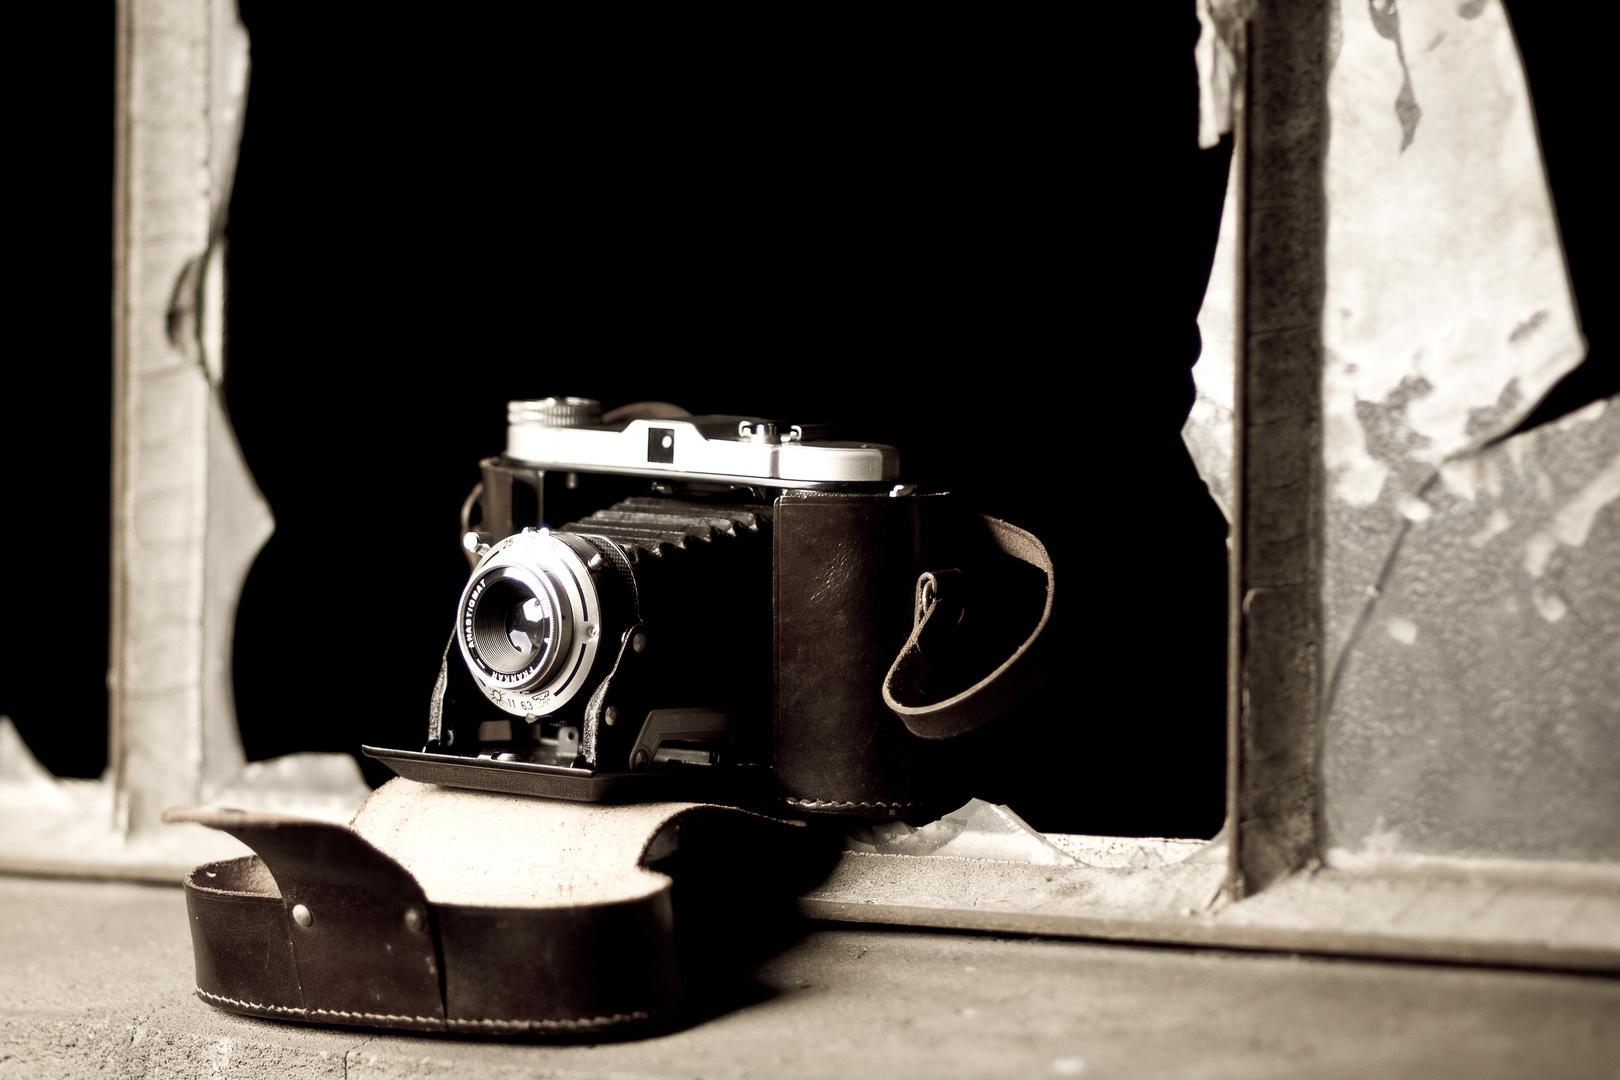 Kamera vom Opa